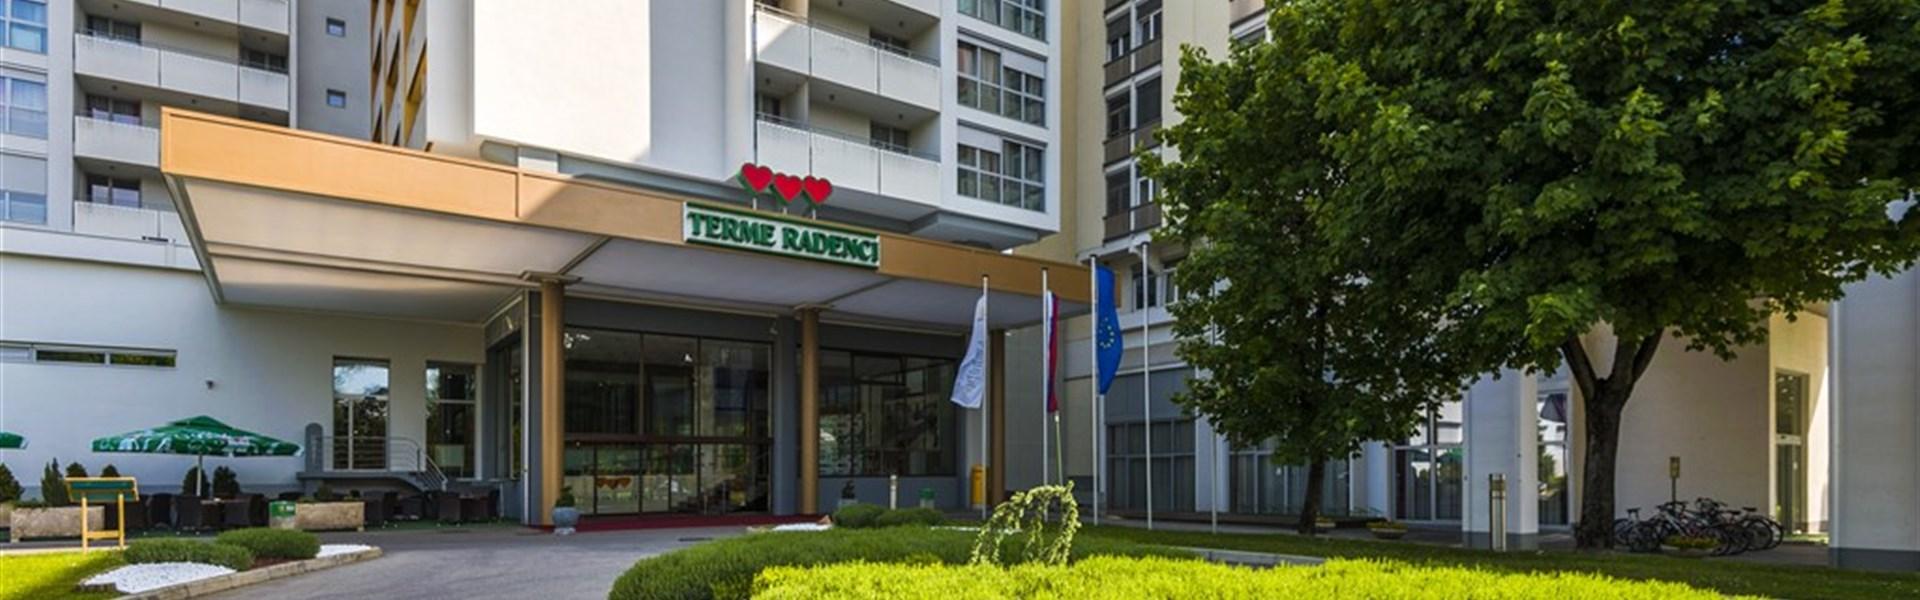 Hotel Radin -